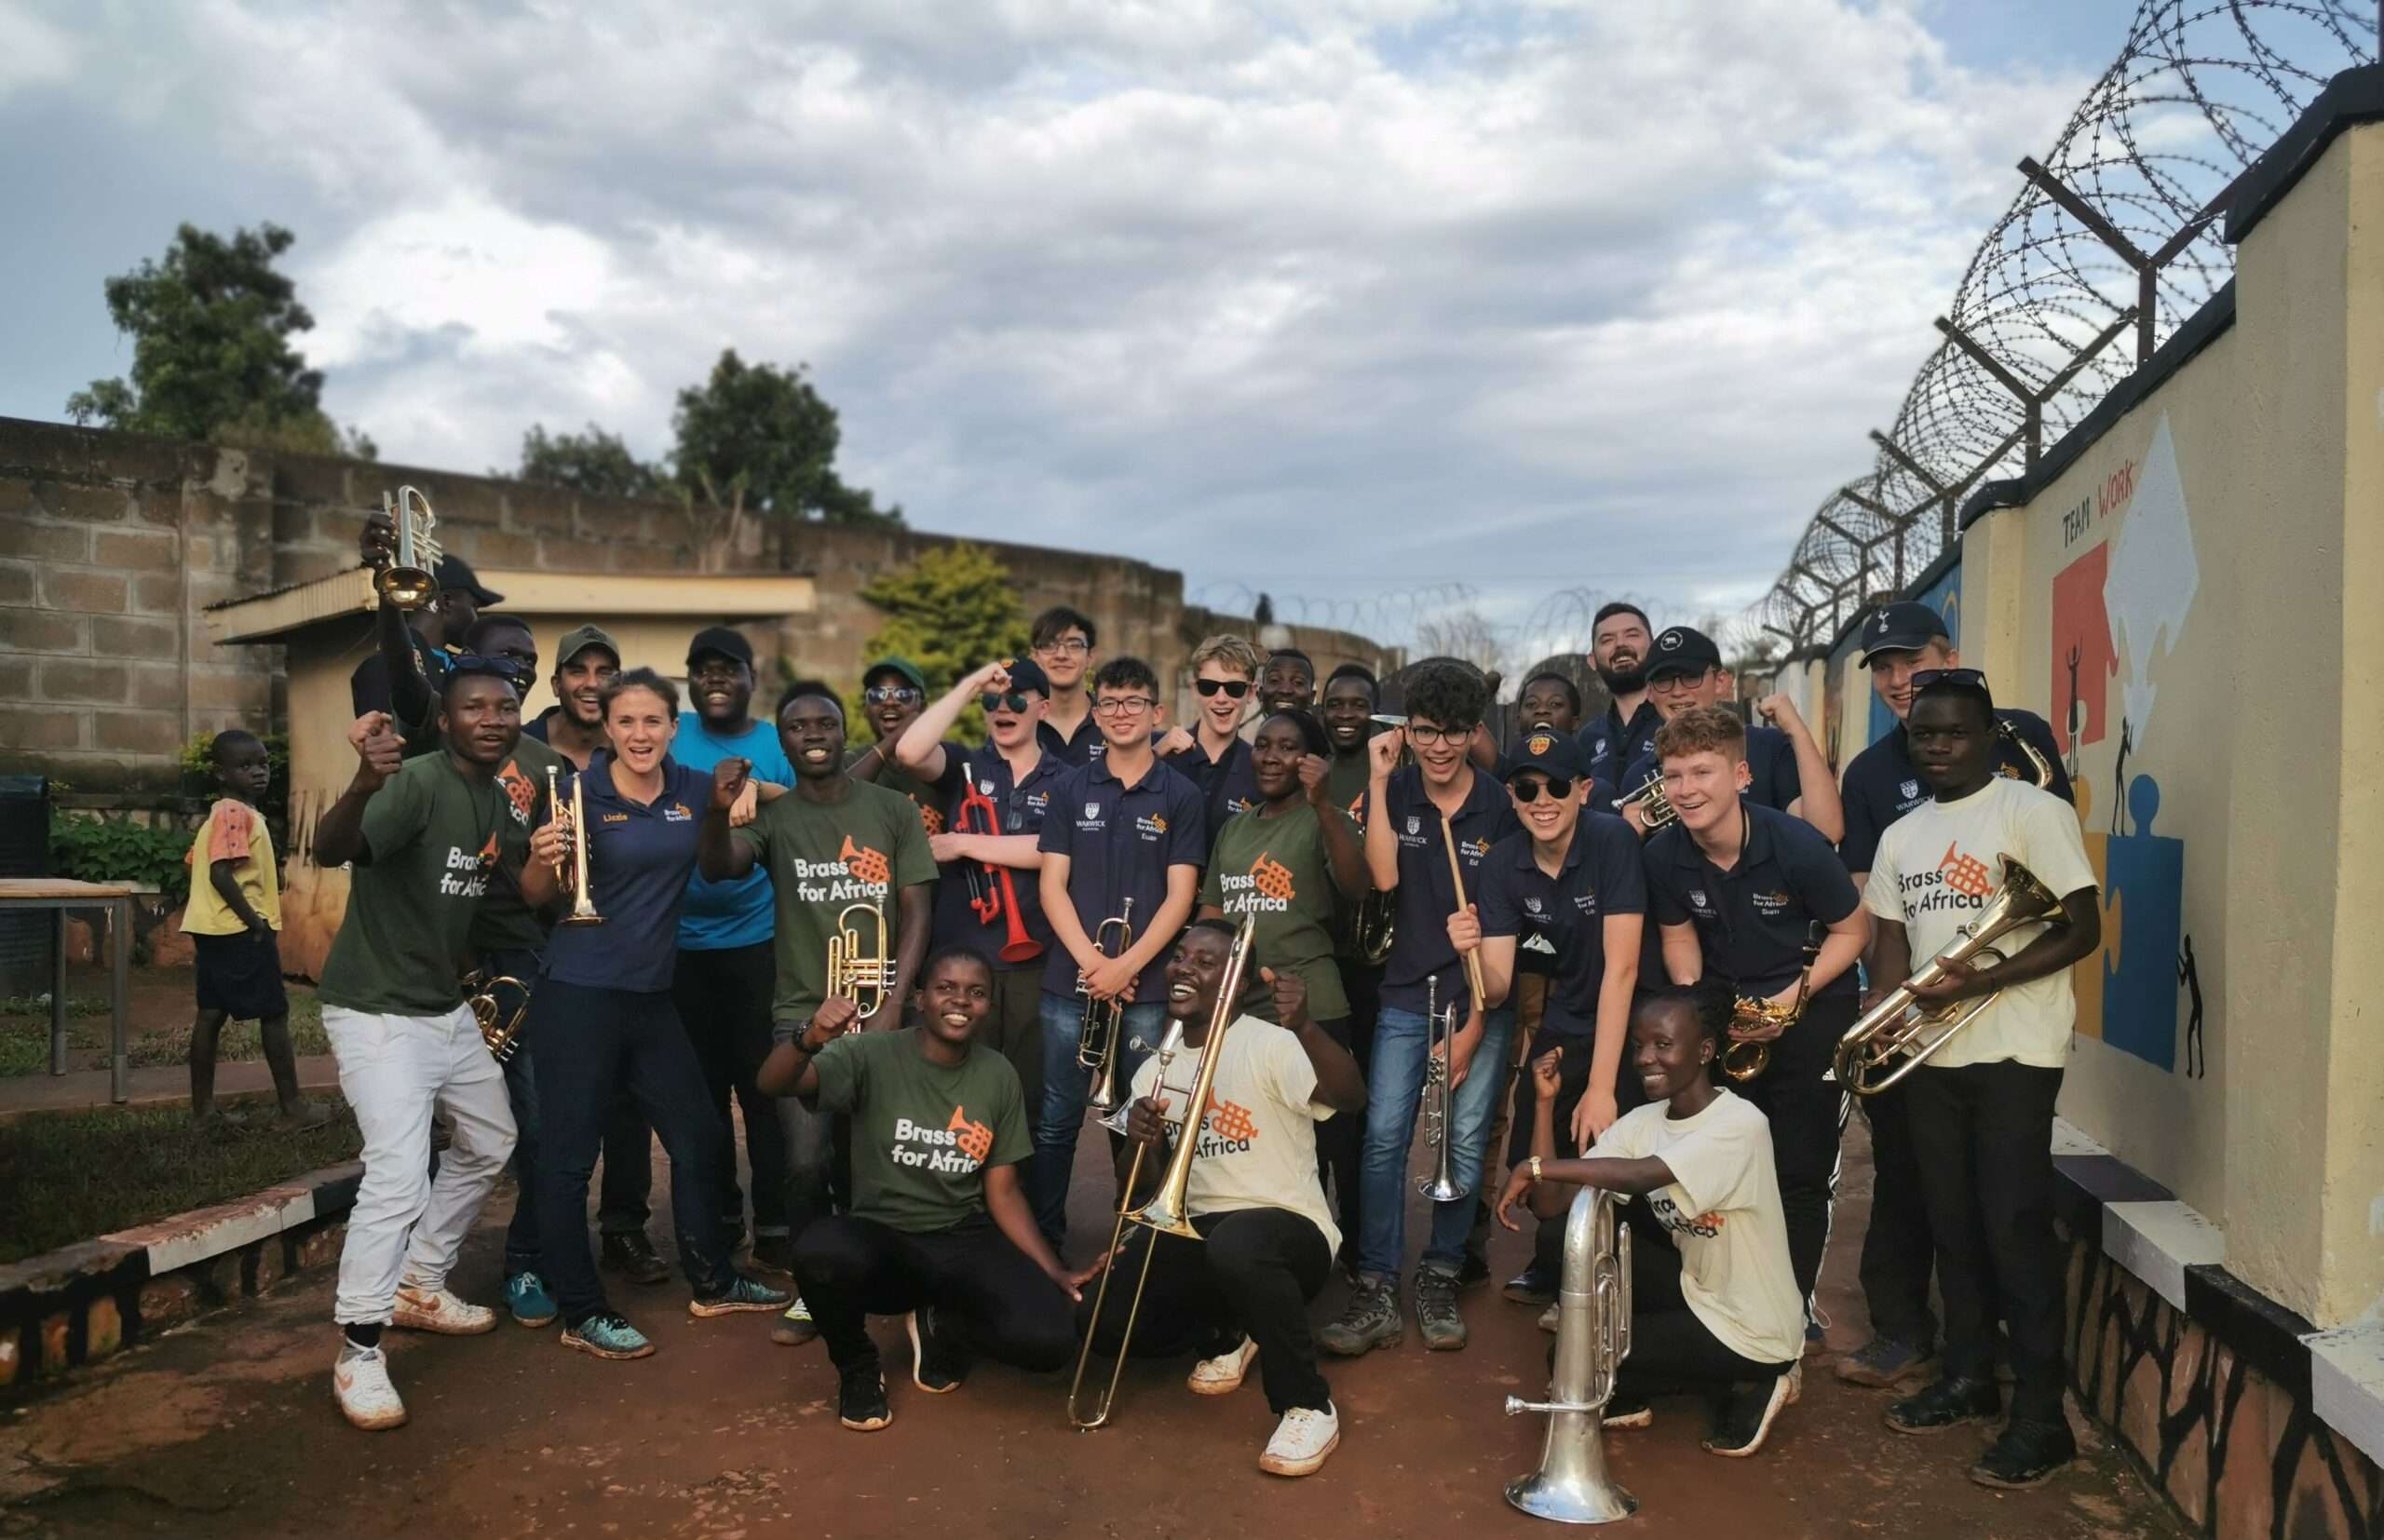 Warwick school tour to uganda - Warwick and BfA teacher band